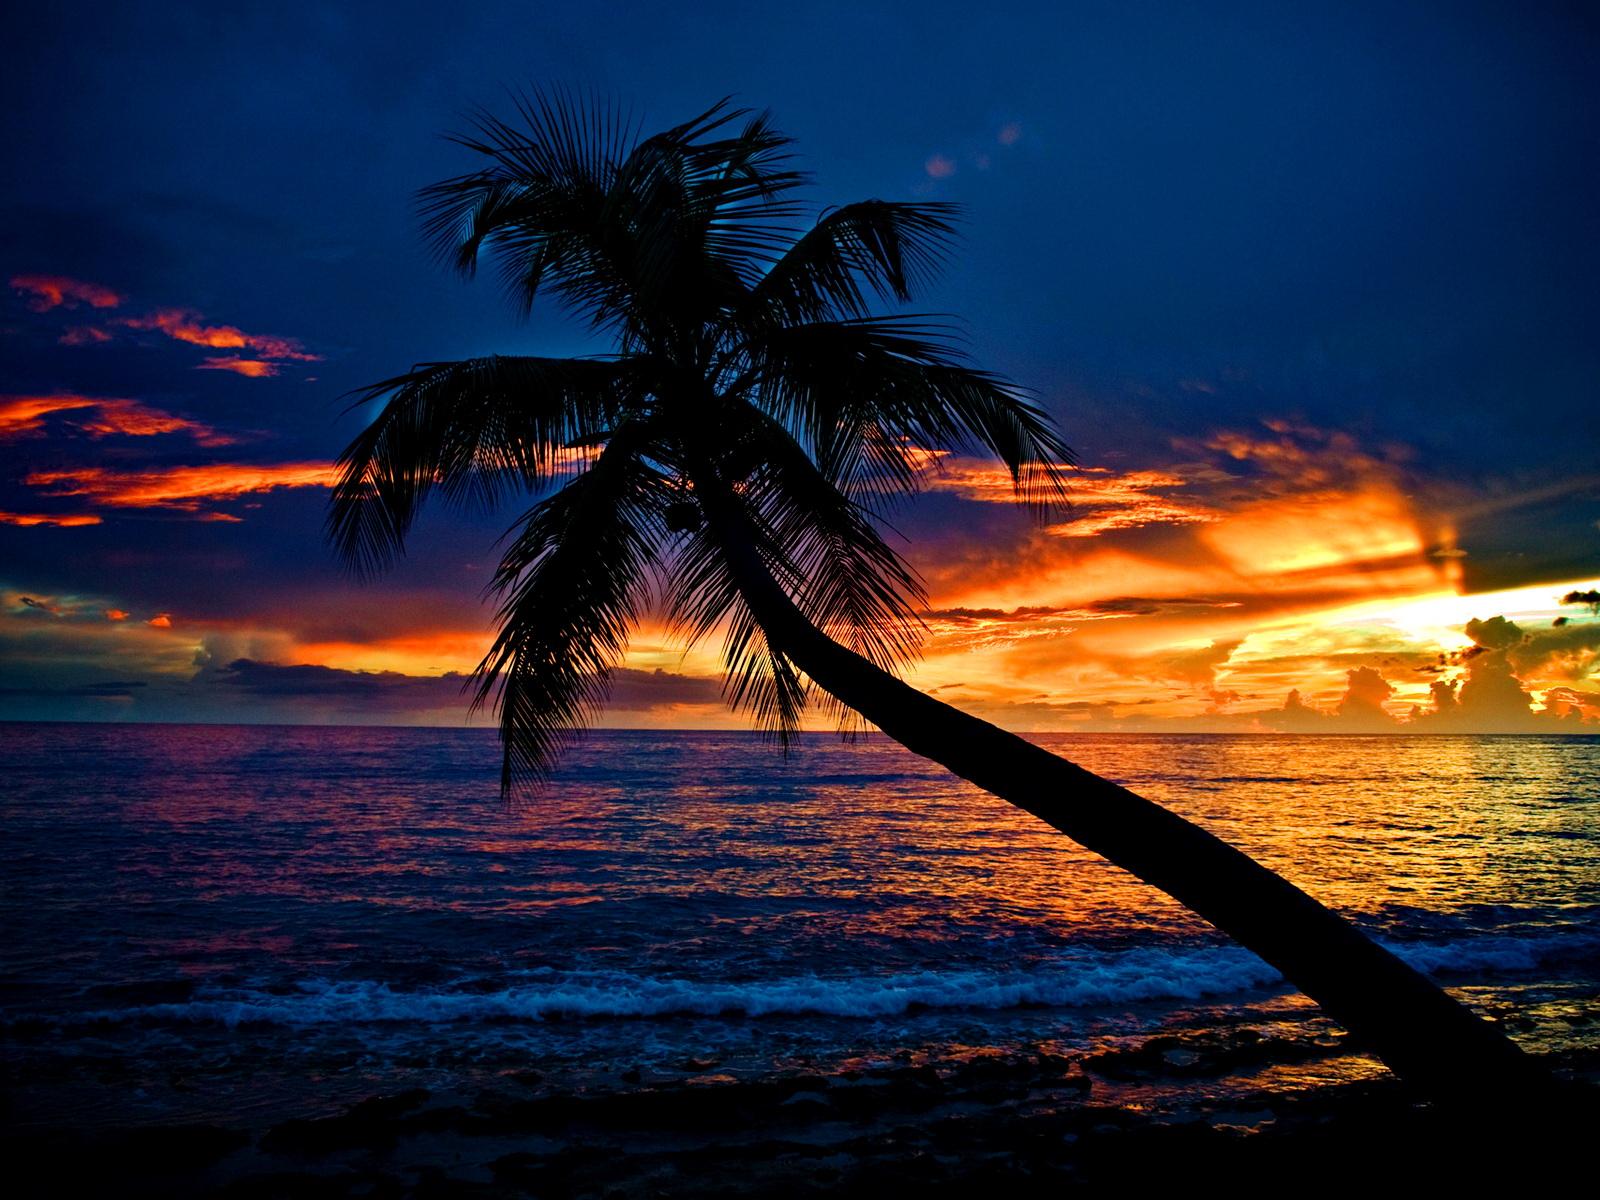 Tropical Sunset Computer Wallpapers, Desktop Backgrounds | 1600x1200 ...